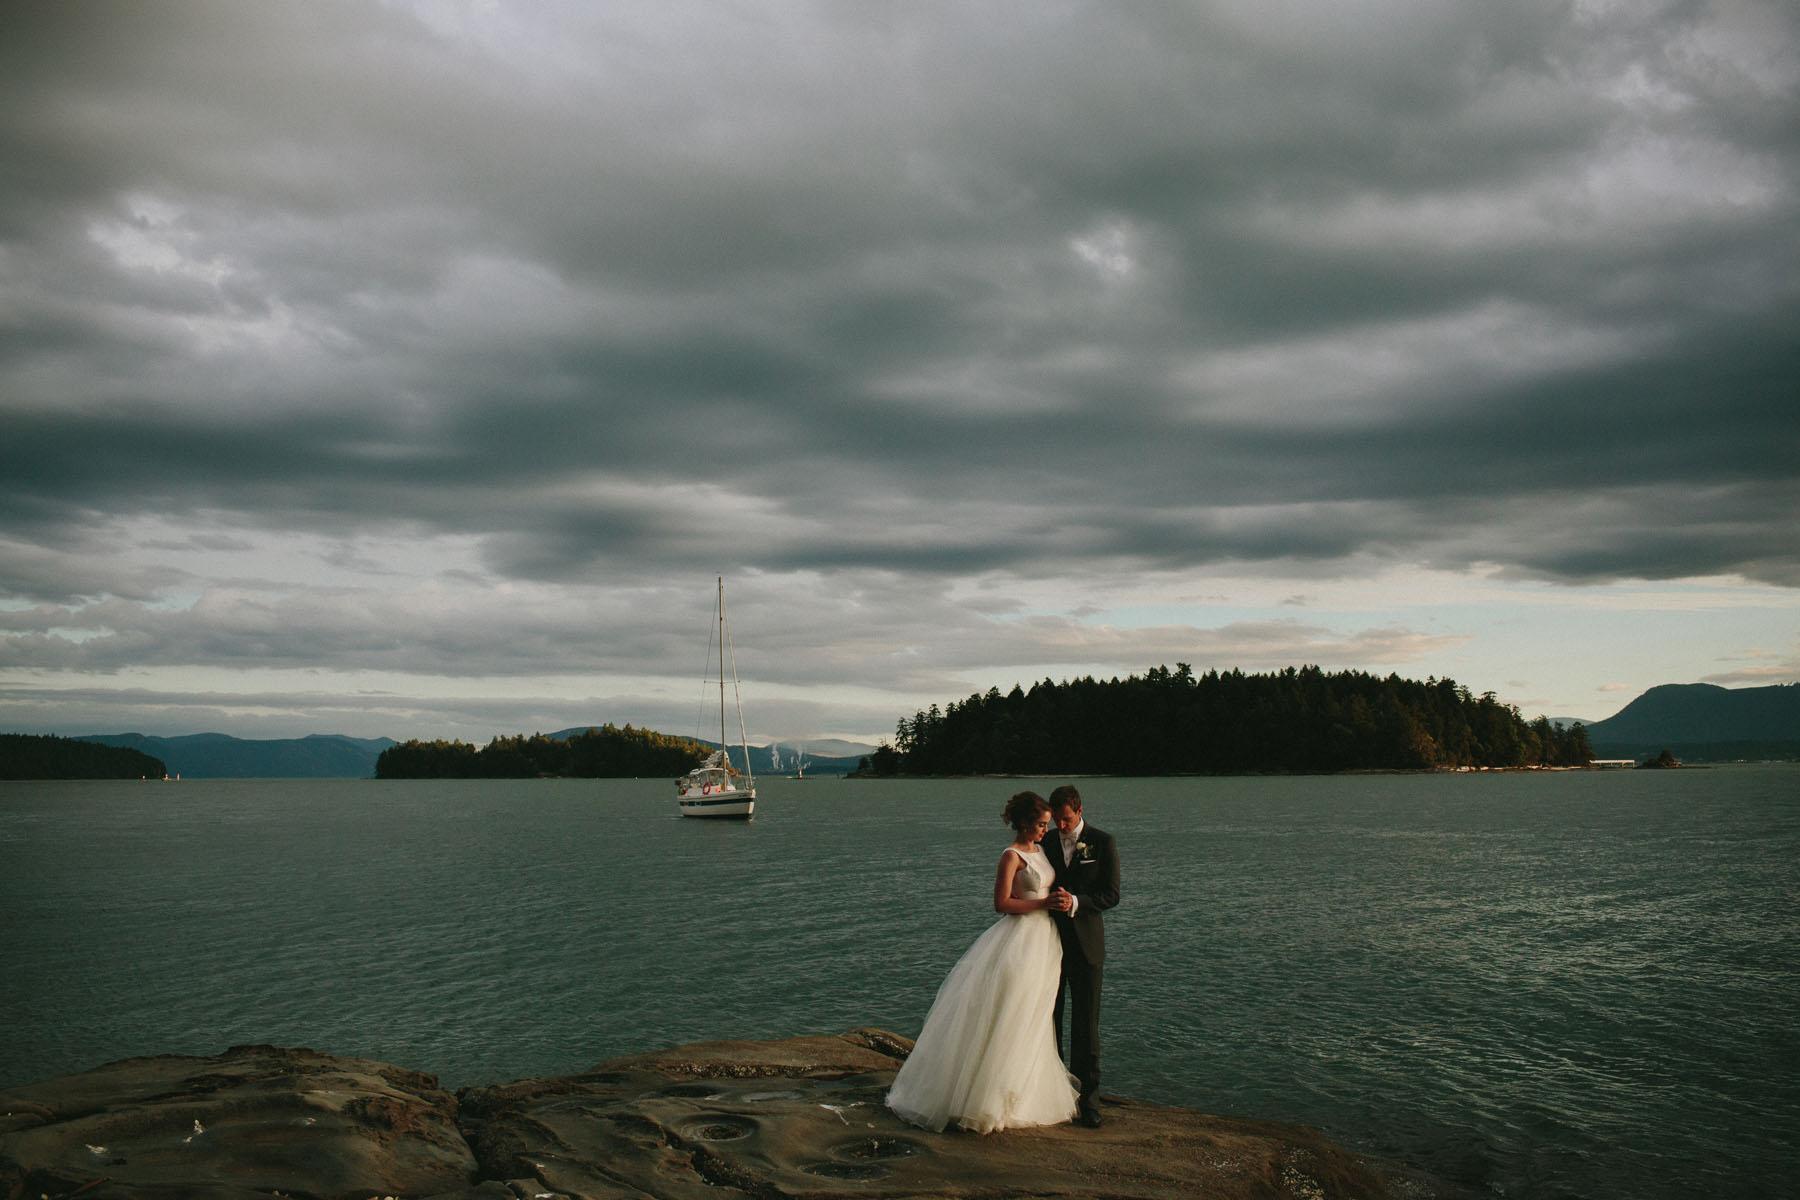 thetis-island-wedding-photographer-rp-rn-139.jpg